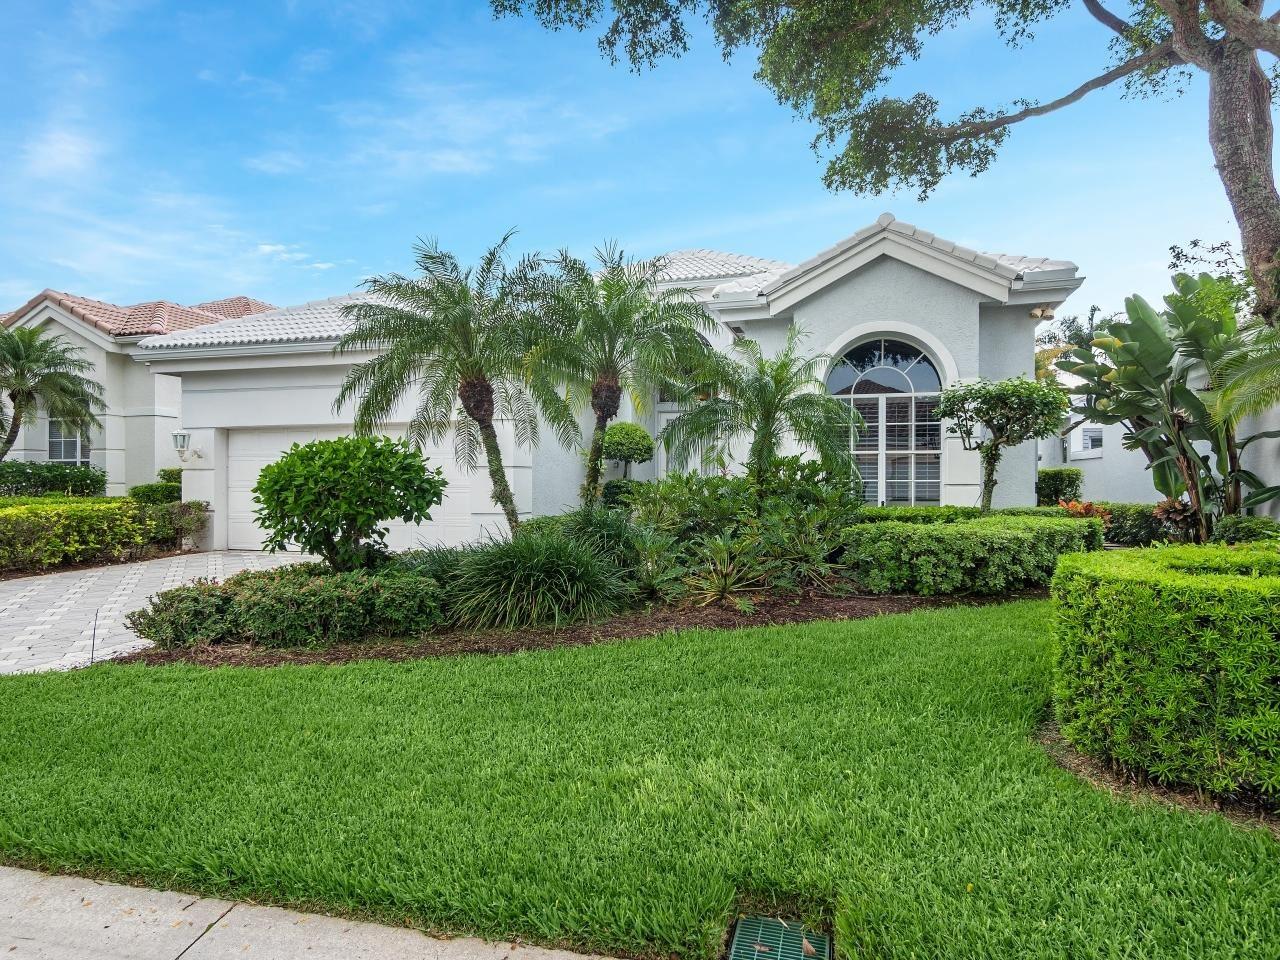 Photo of 130 Windward Drive, Palm Beach Gardens, FL 33418 (MLS # RX-10730269)